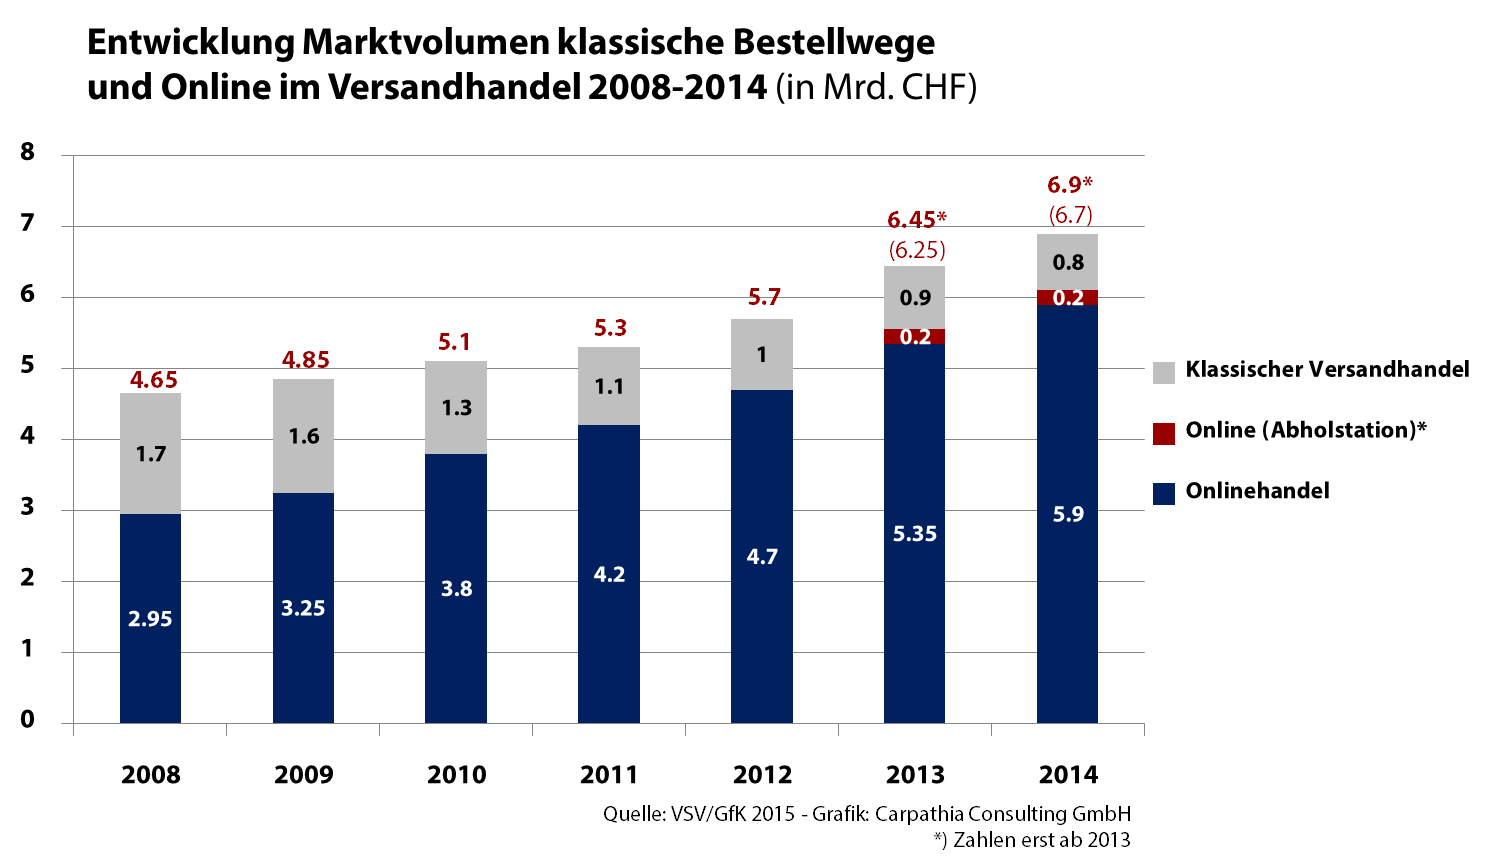 Markvolumen im Versandhandel 2008-2014 - Quelle: VSV/GfK / Grafik: Carpathia